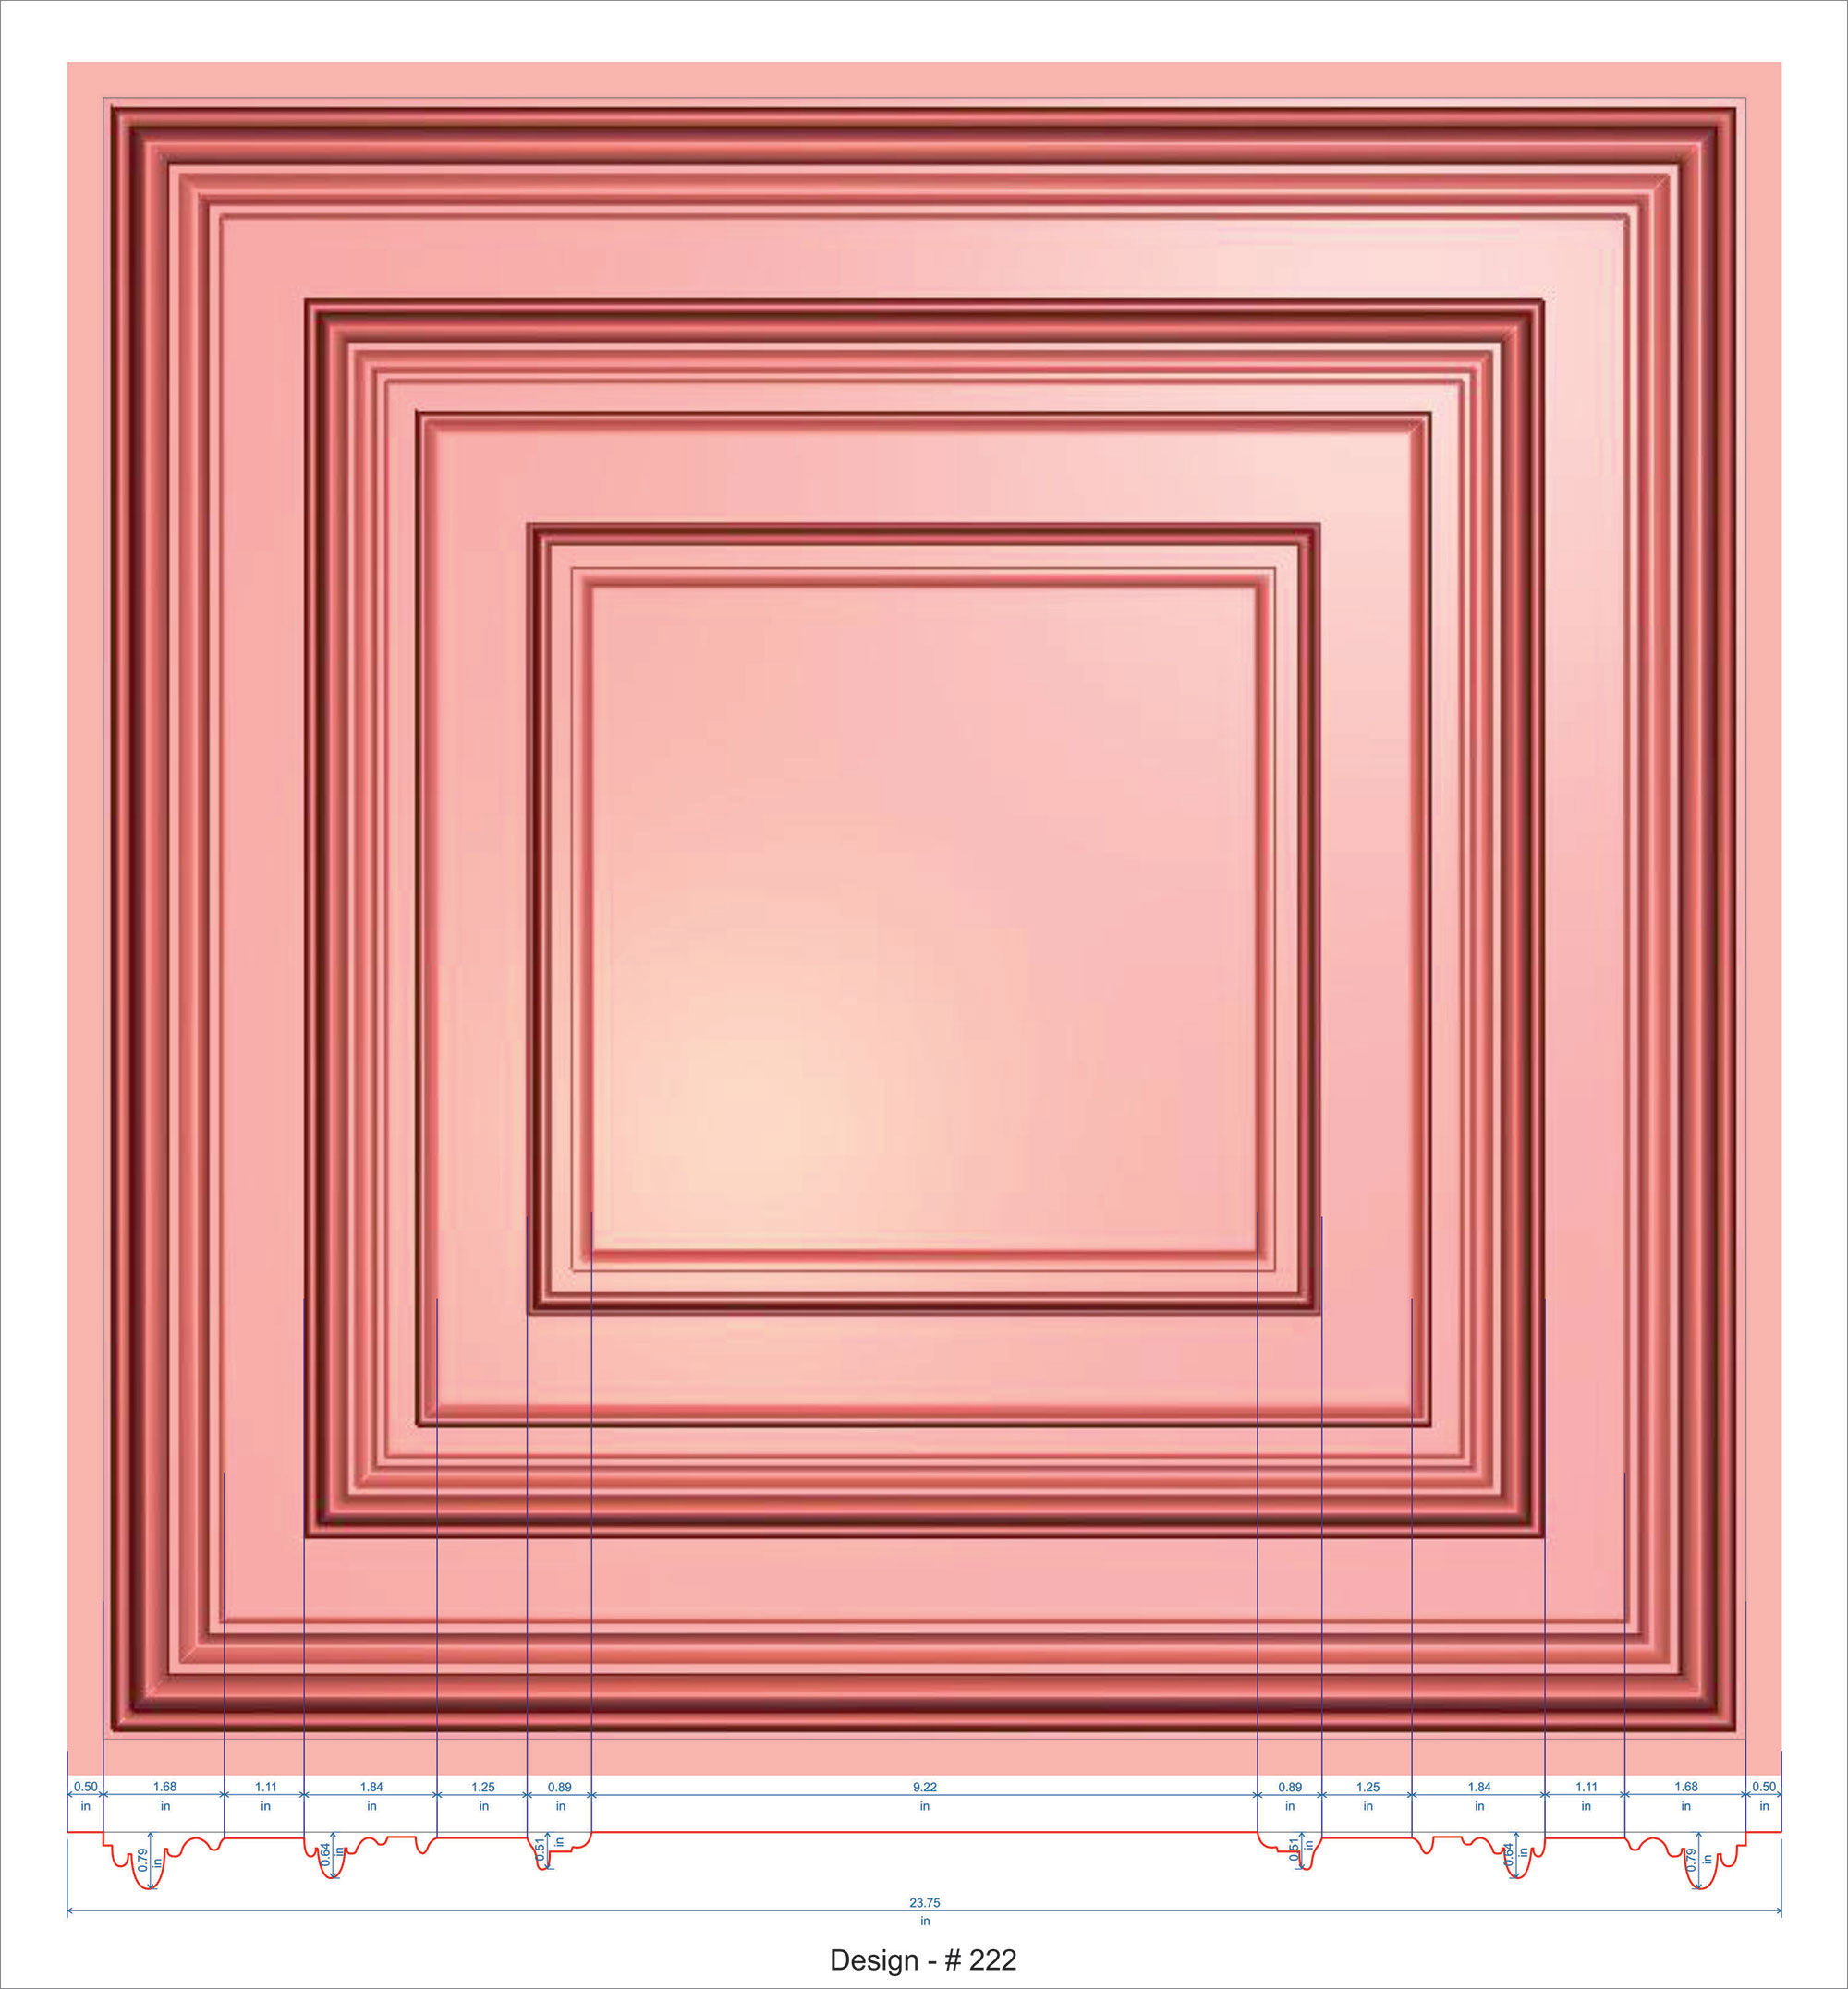 2 x 2 ceiling tiles